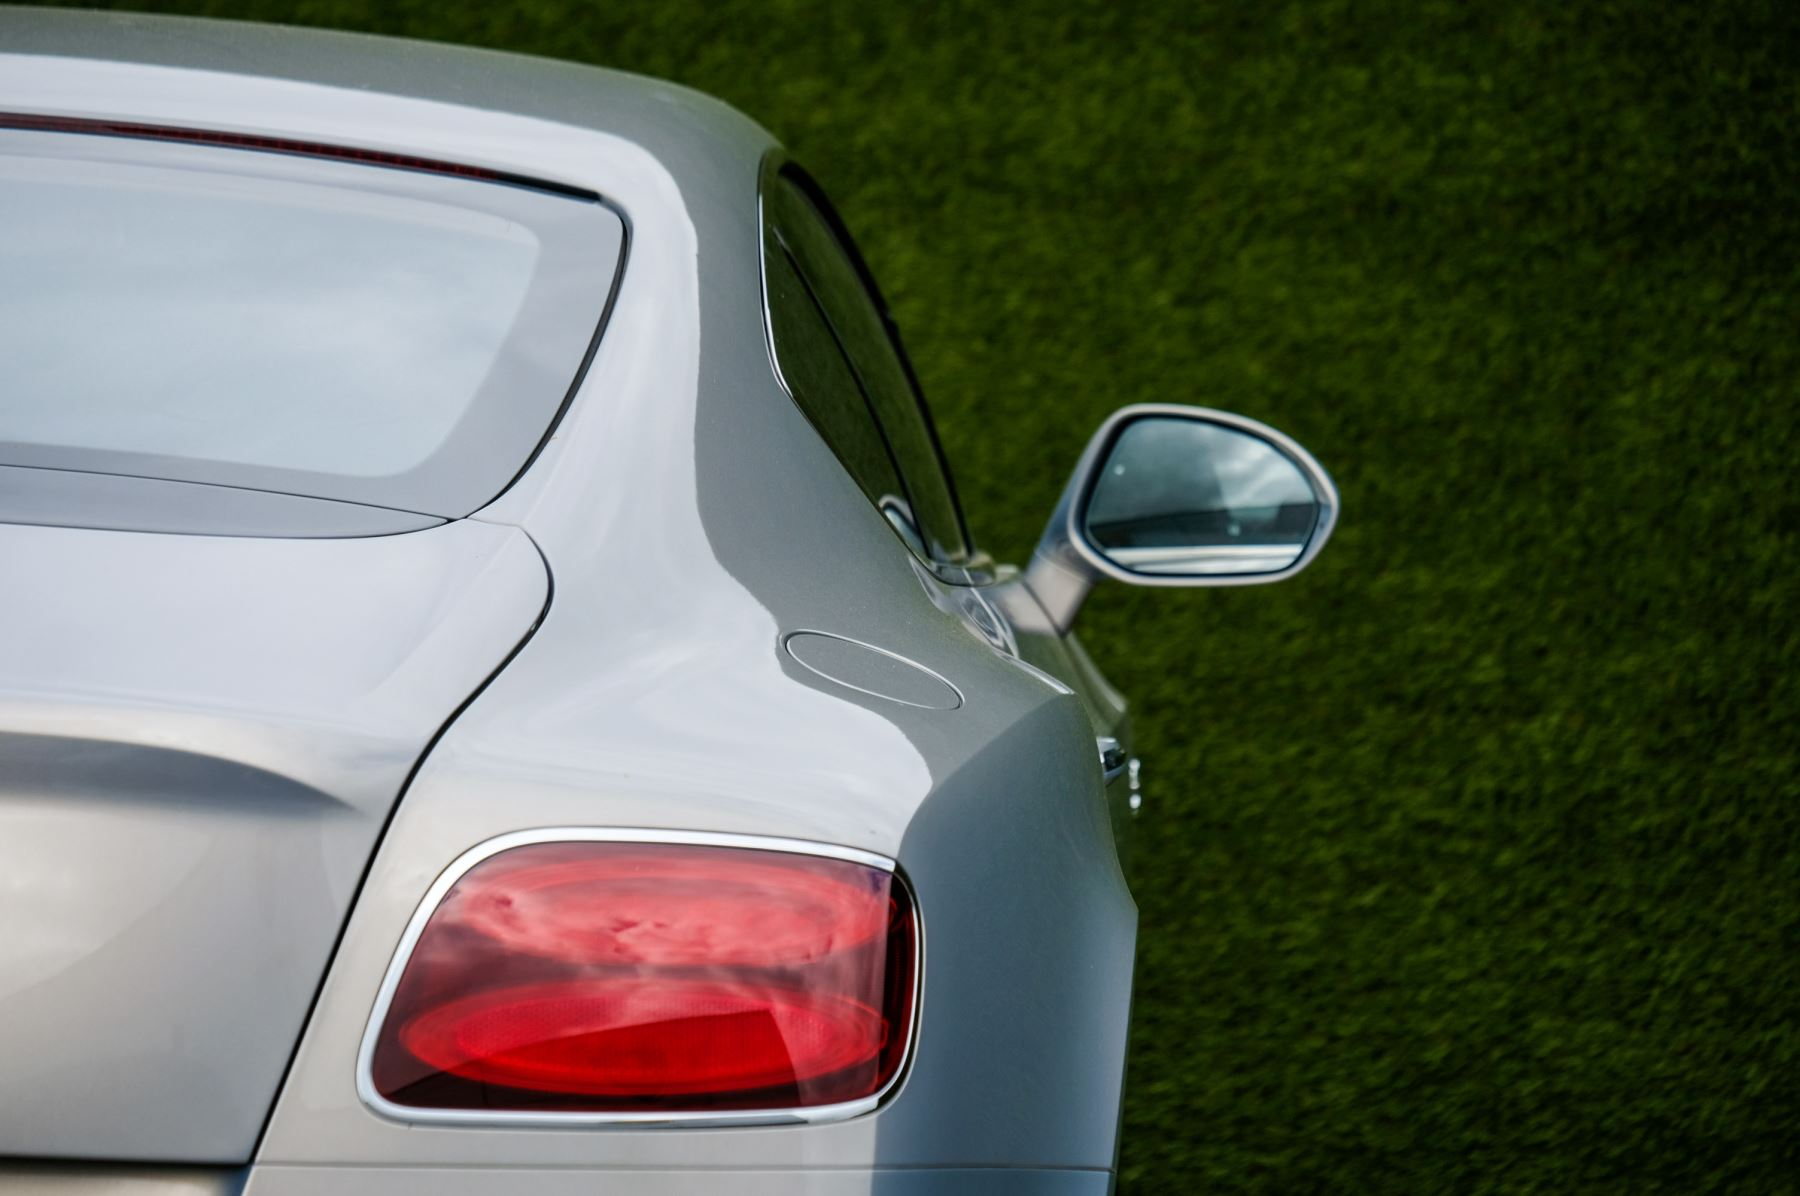 Bentley Continental GT 6.0 W12 [635] Speed - Premier Specification - Carbon Fibre Fascia Panels image 7